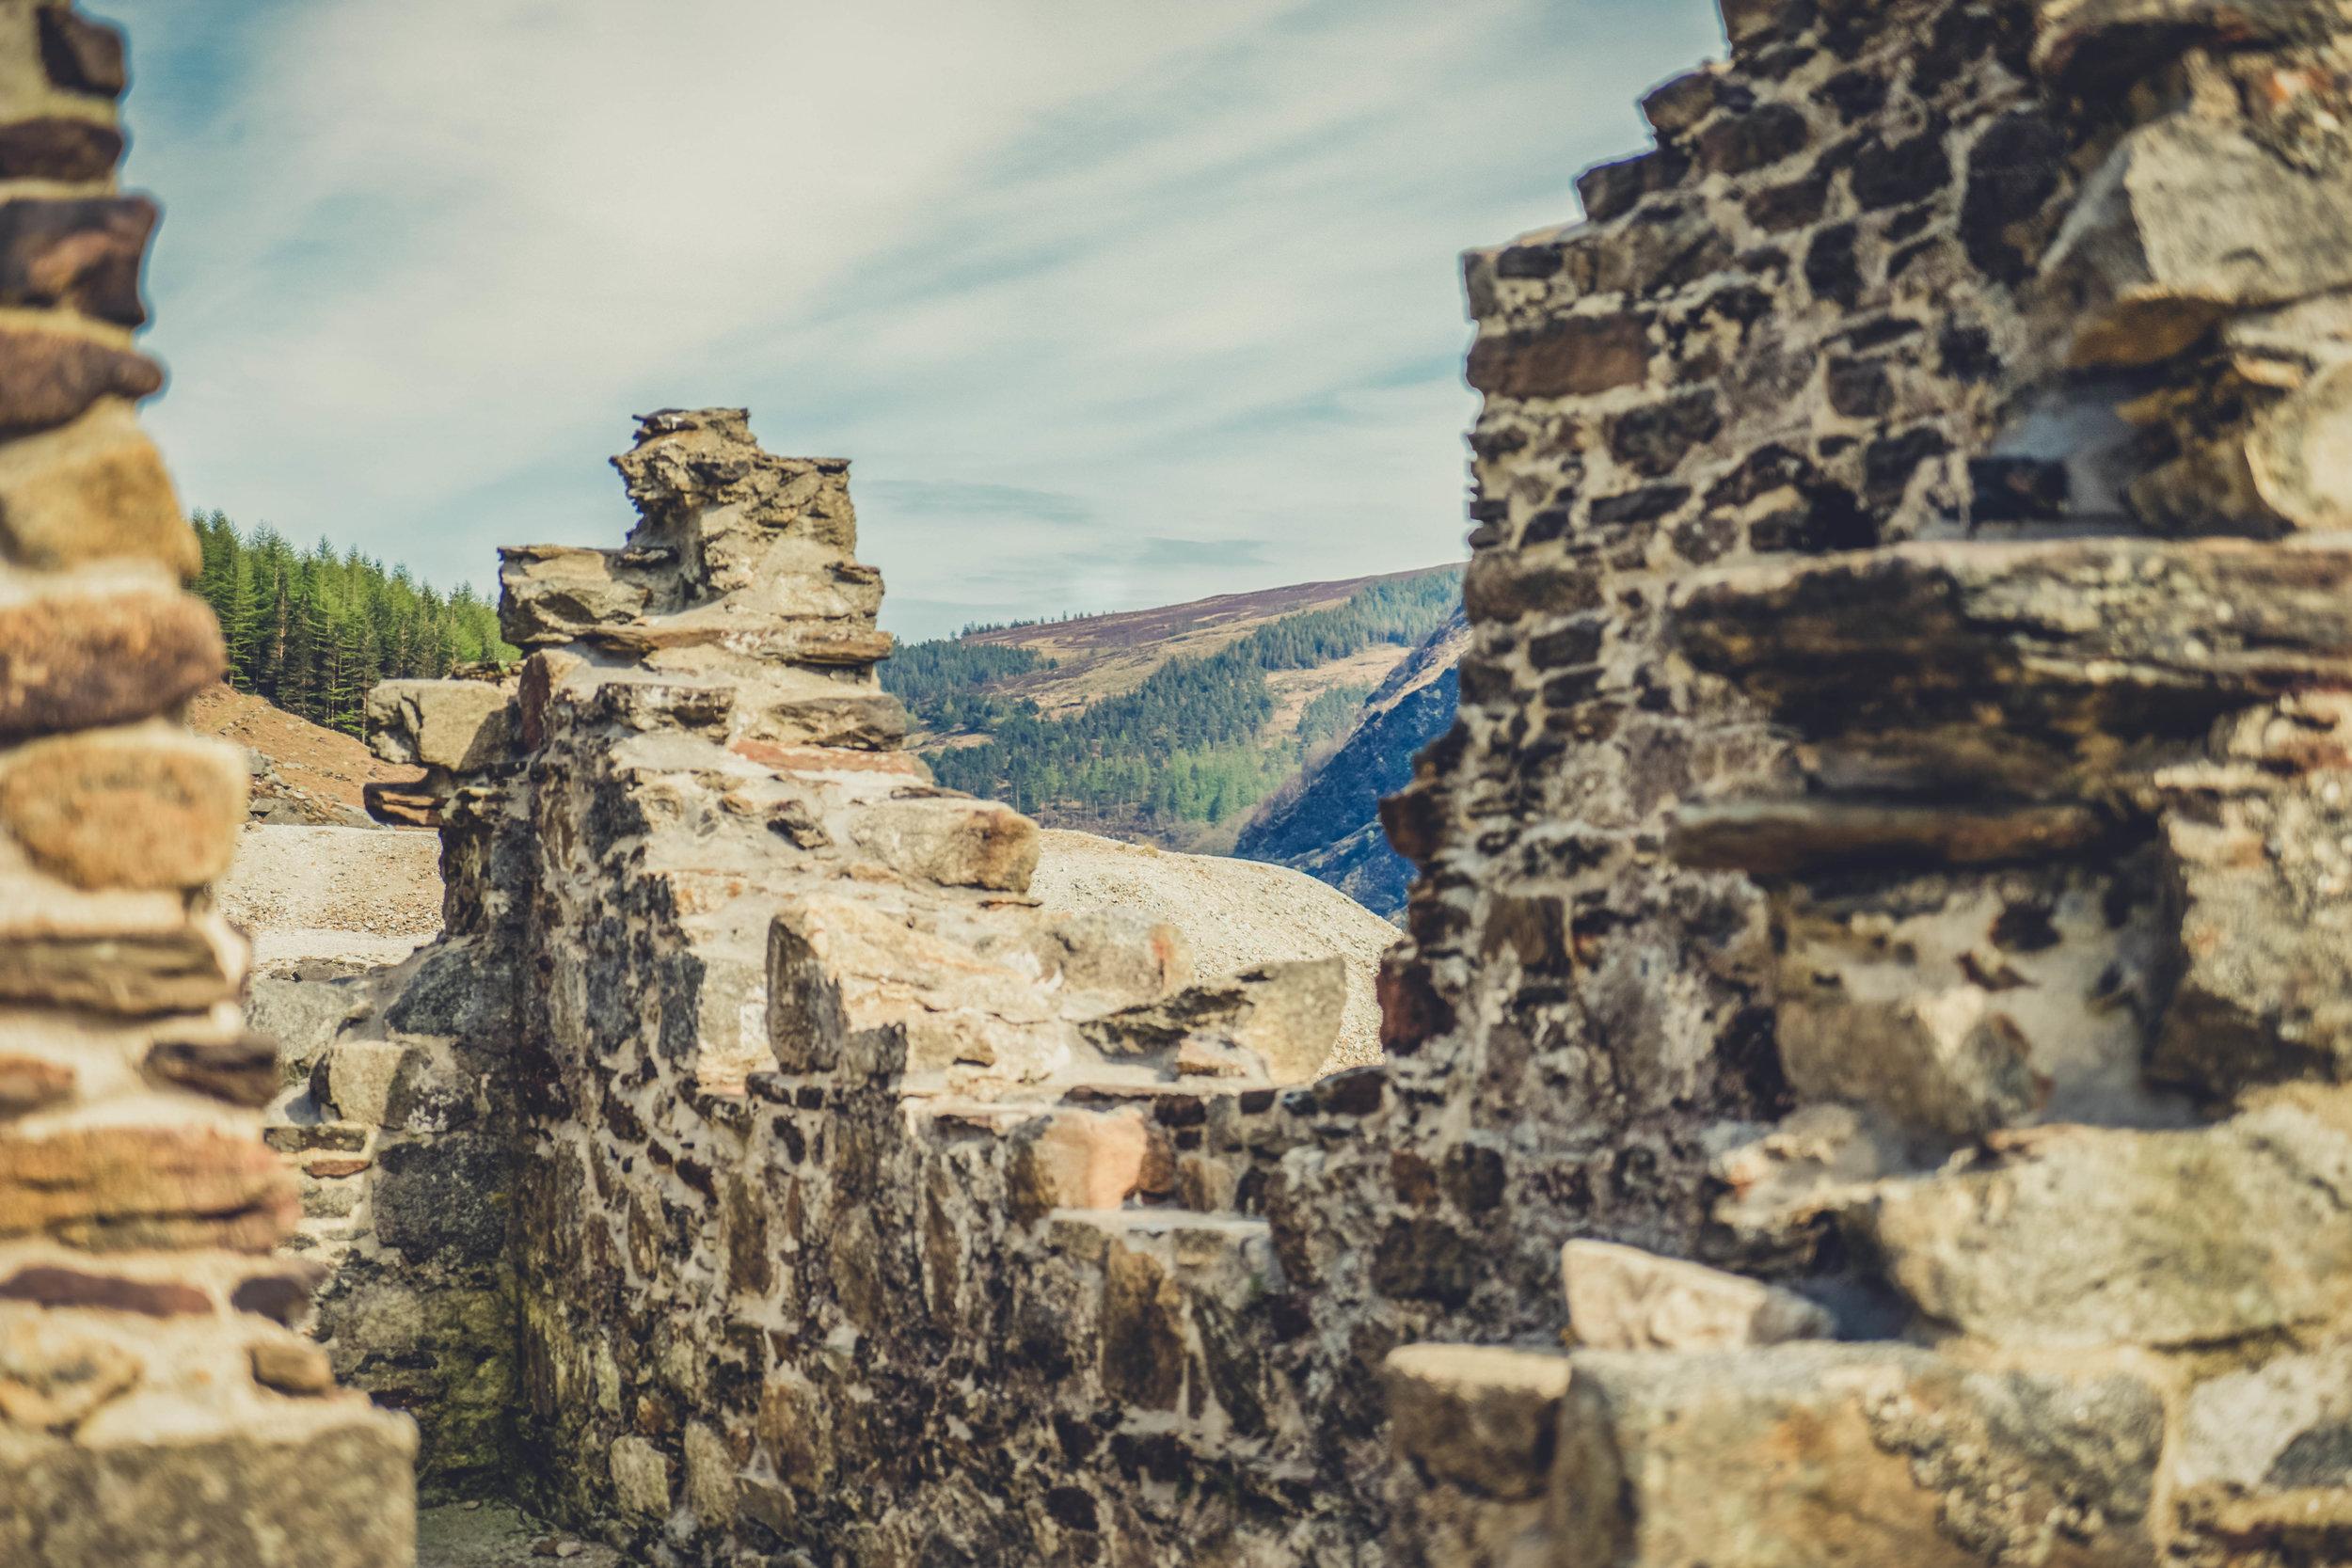 glendalough. irish history. county wicklow. round tower. hill walknig. hiking. grave yard. wildlife. tombstones. lakes. blue sky. mining town.jpg